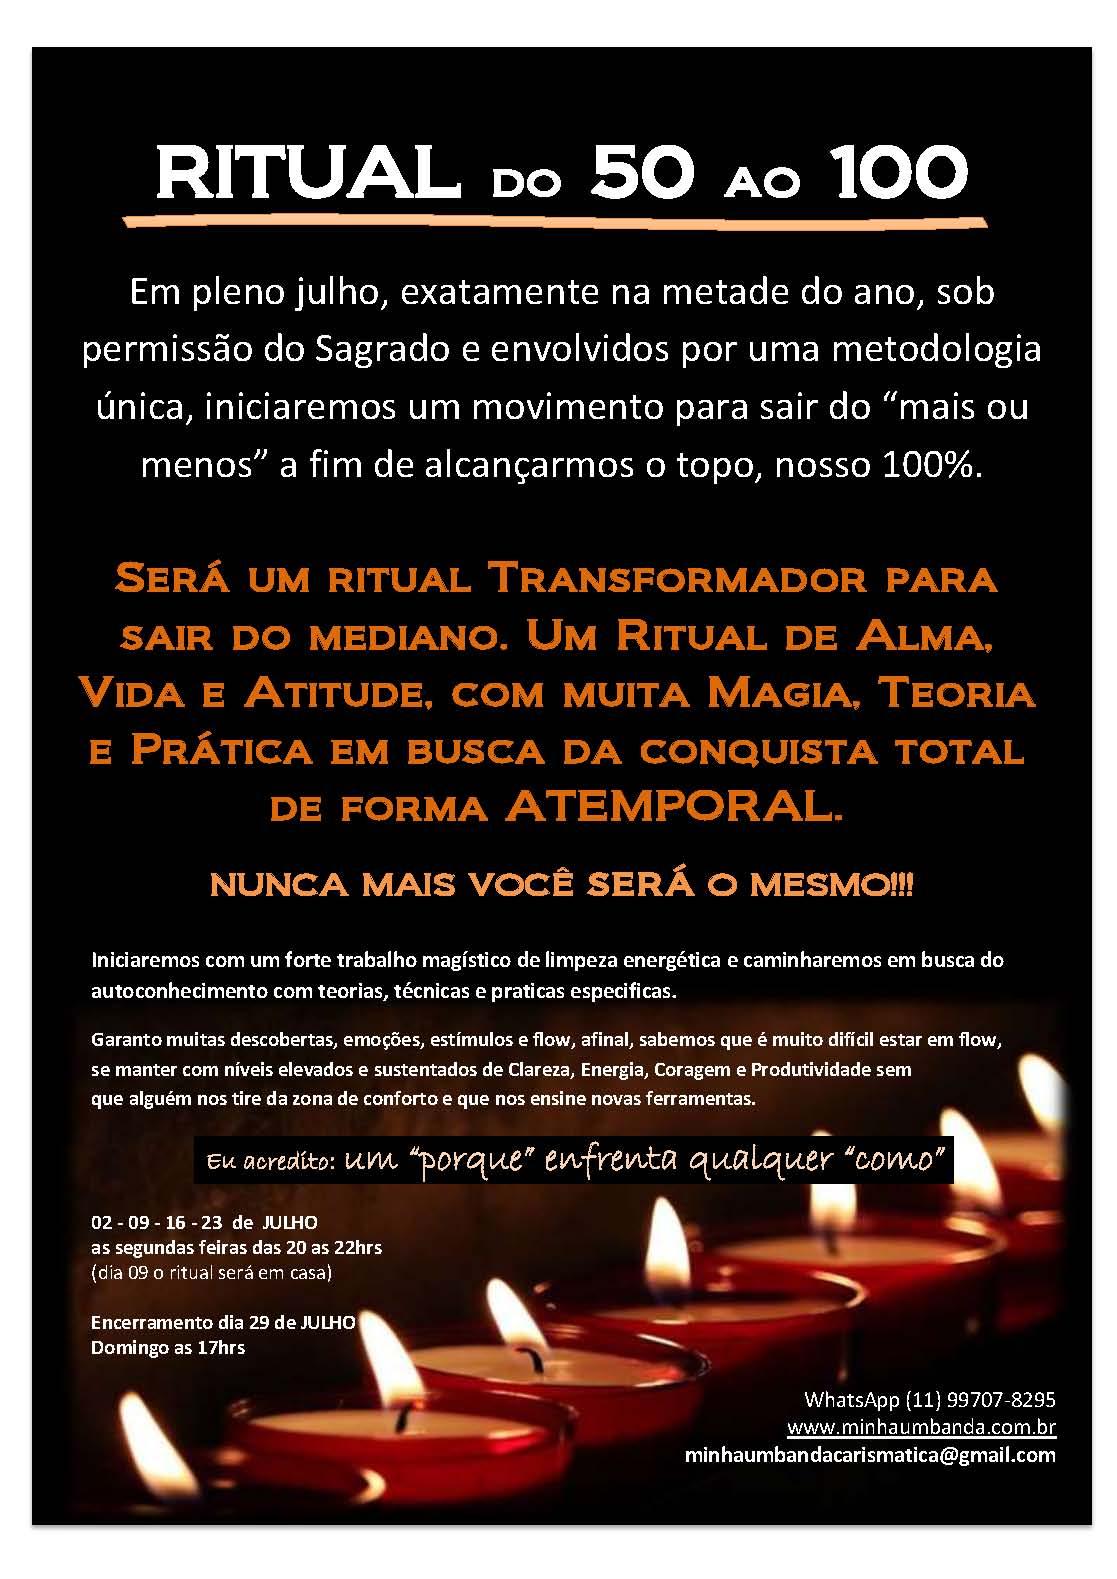 ritual 50 a 100